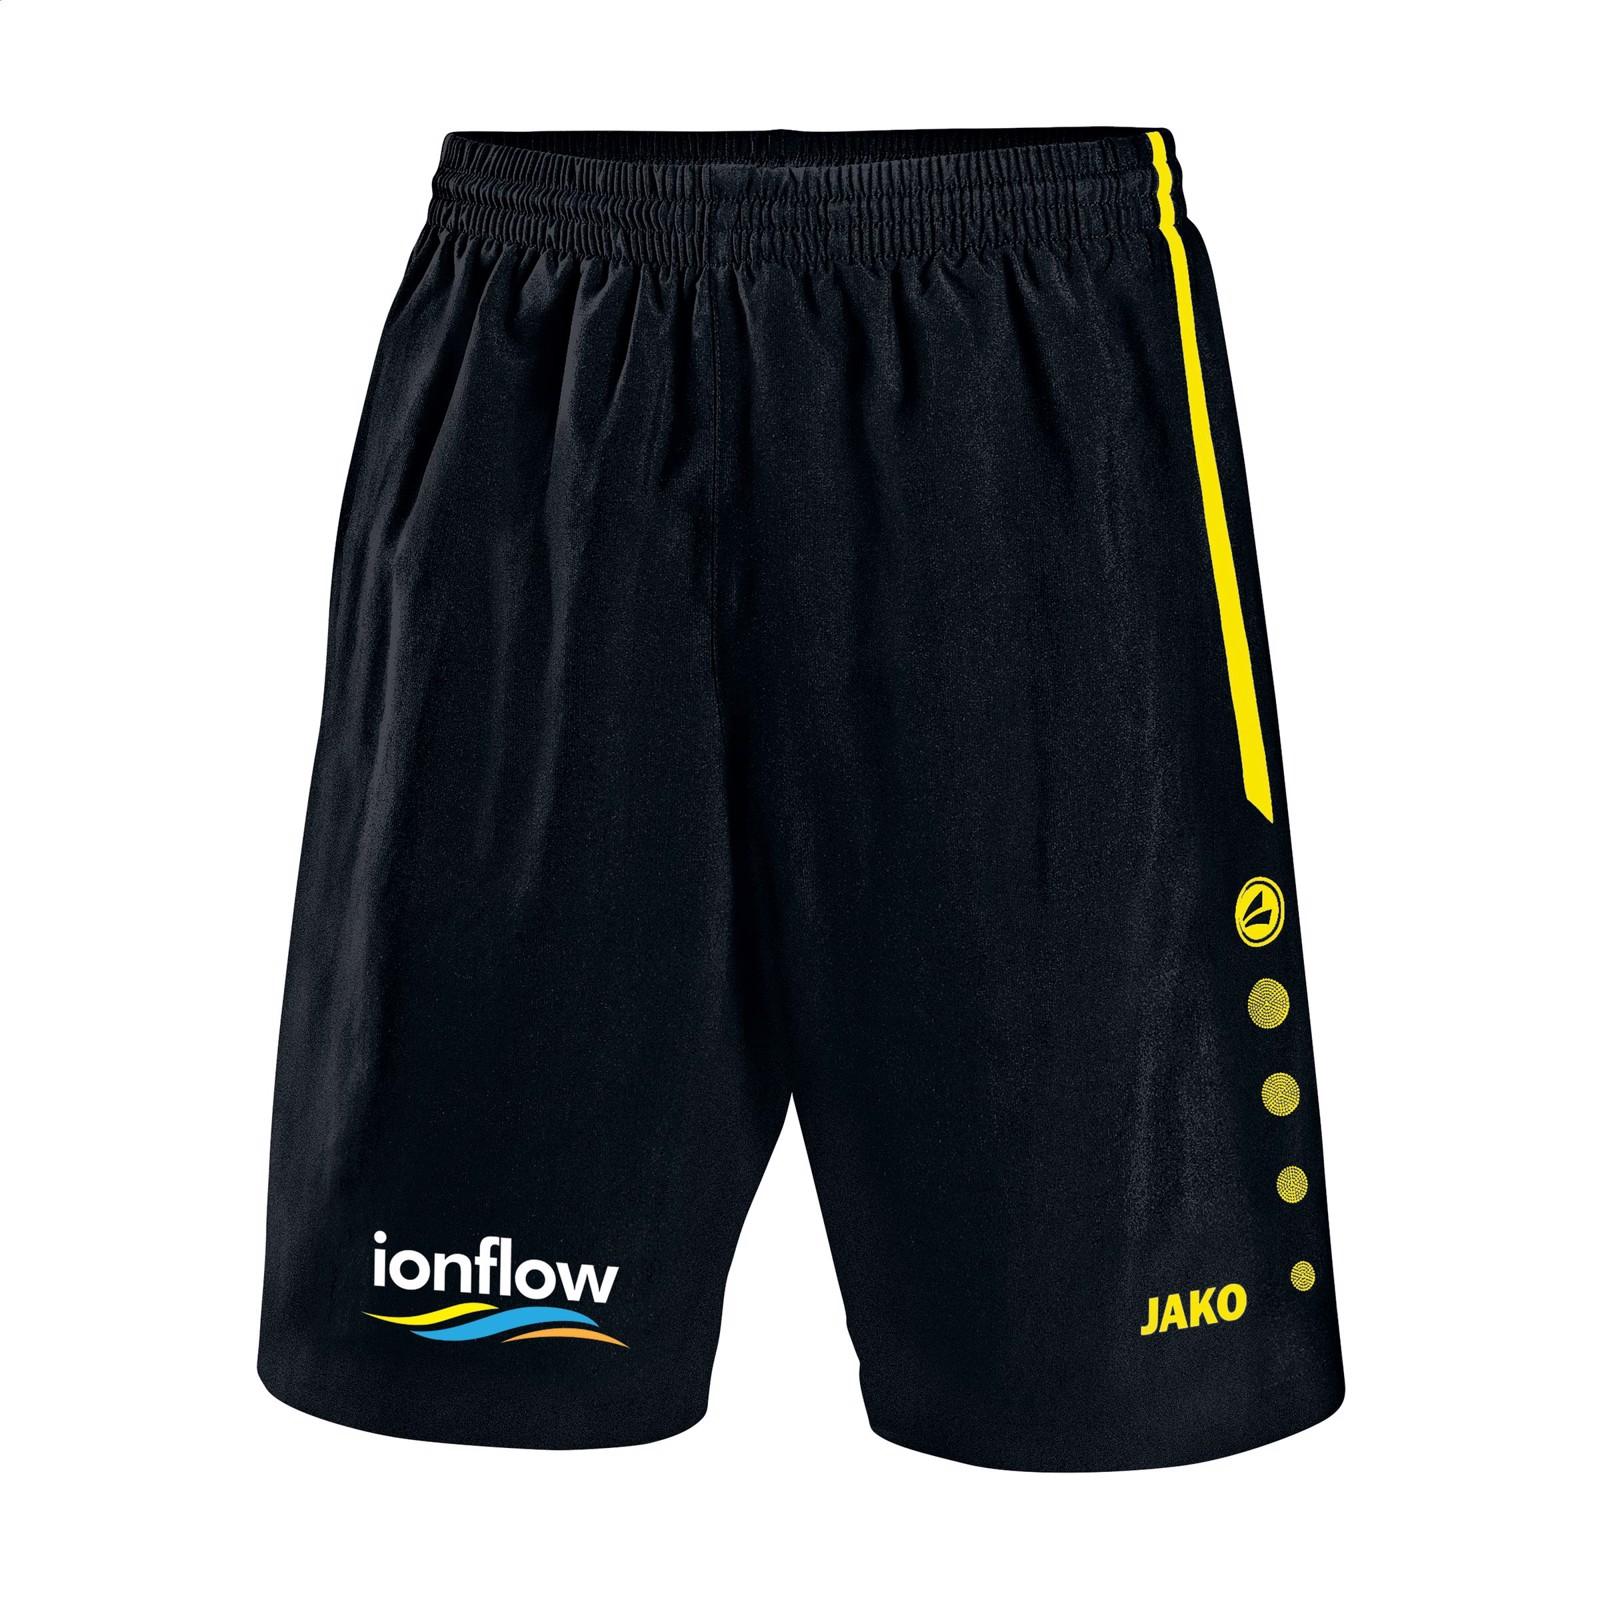 Jako® Short Turin Kids sportspants - Black / Yellow / 152